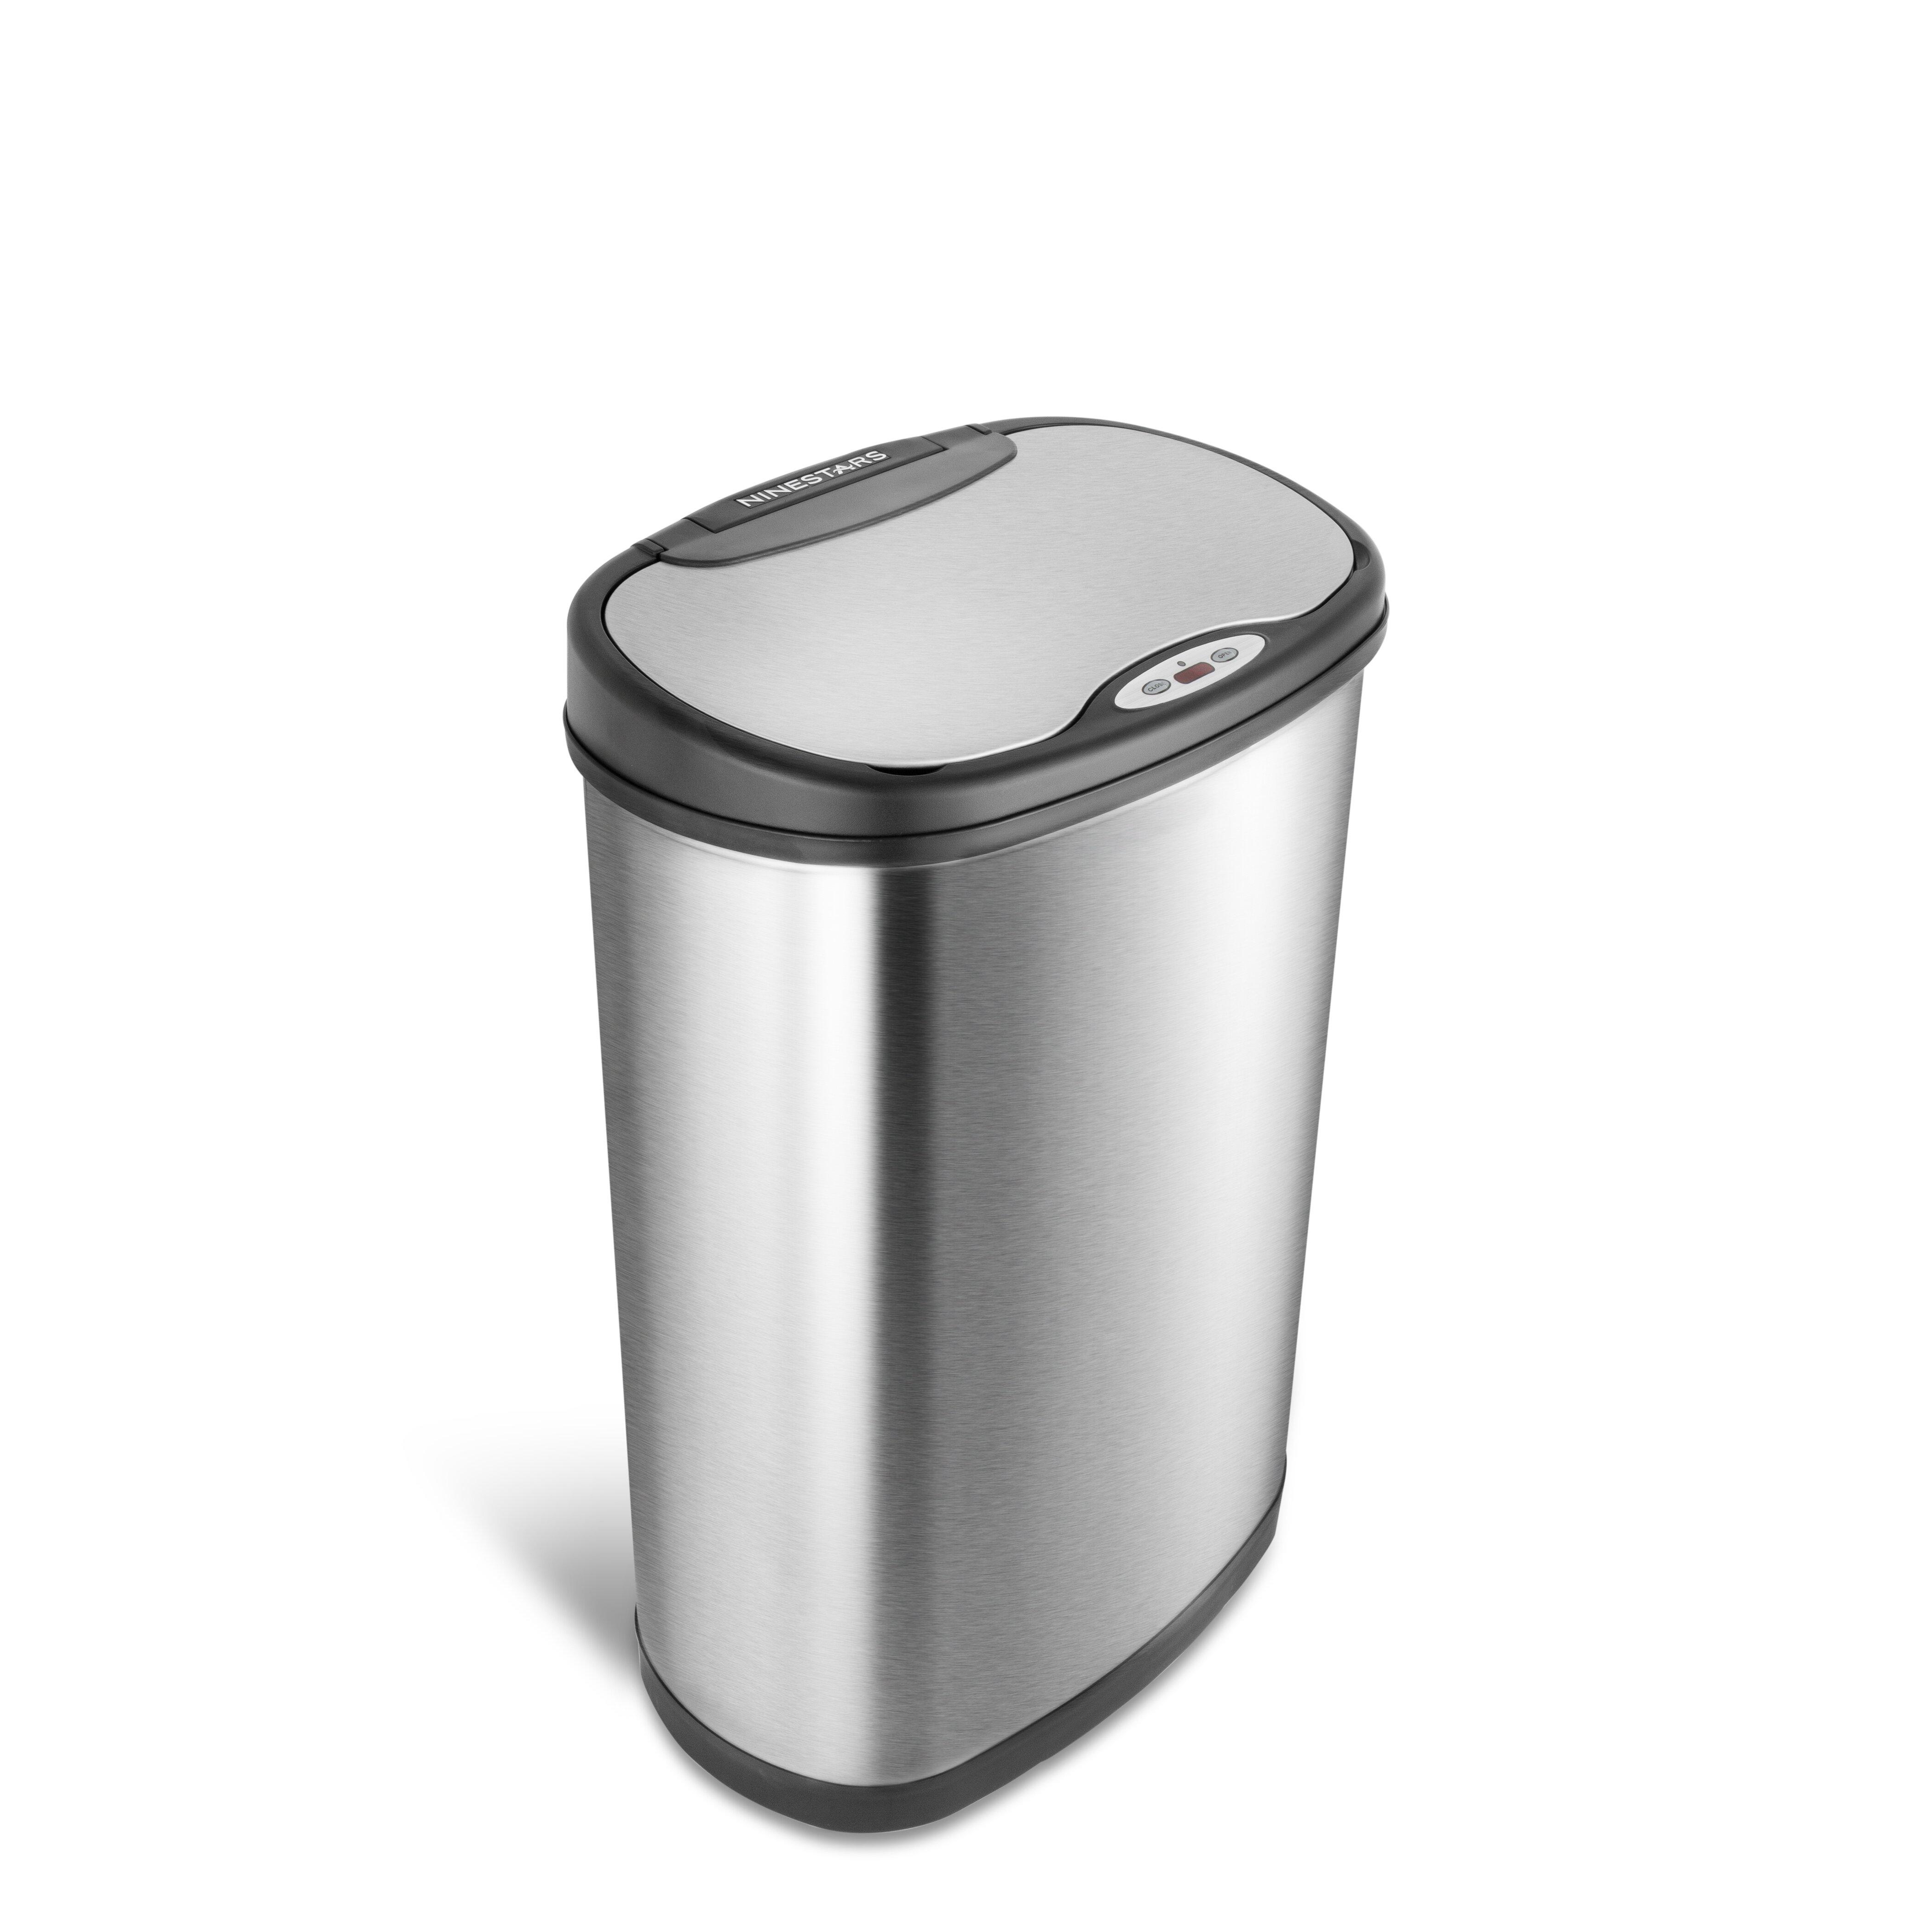 Nine Stars Stainless Steel 13 2 Gallon Motion Sensor Trash Can